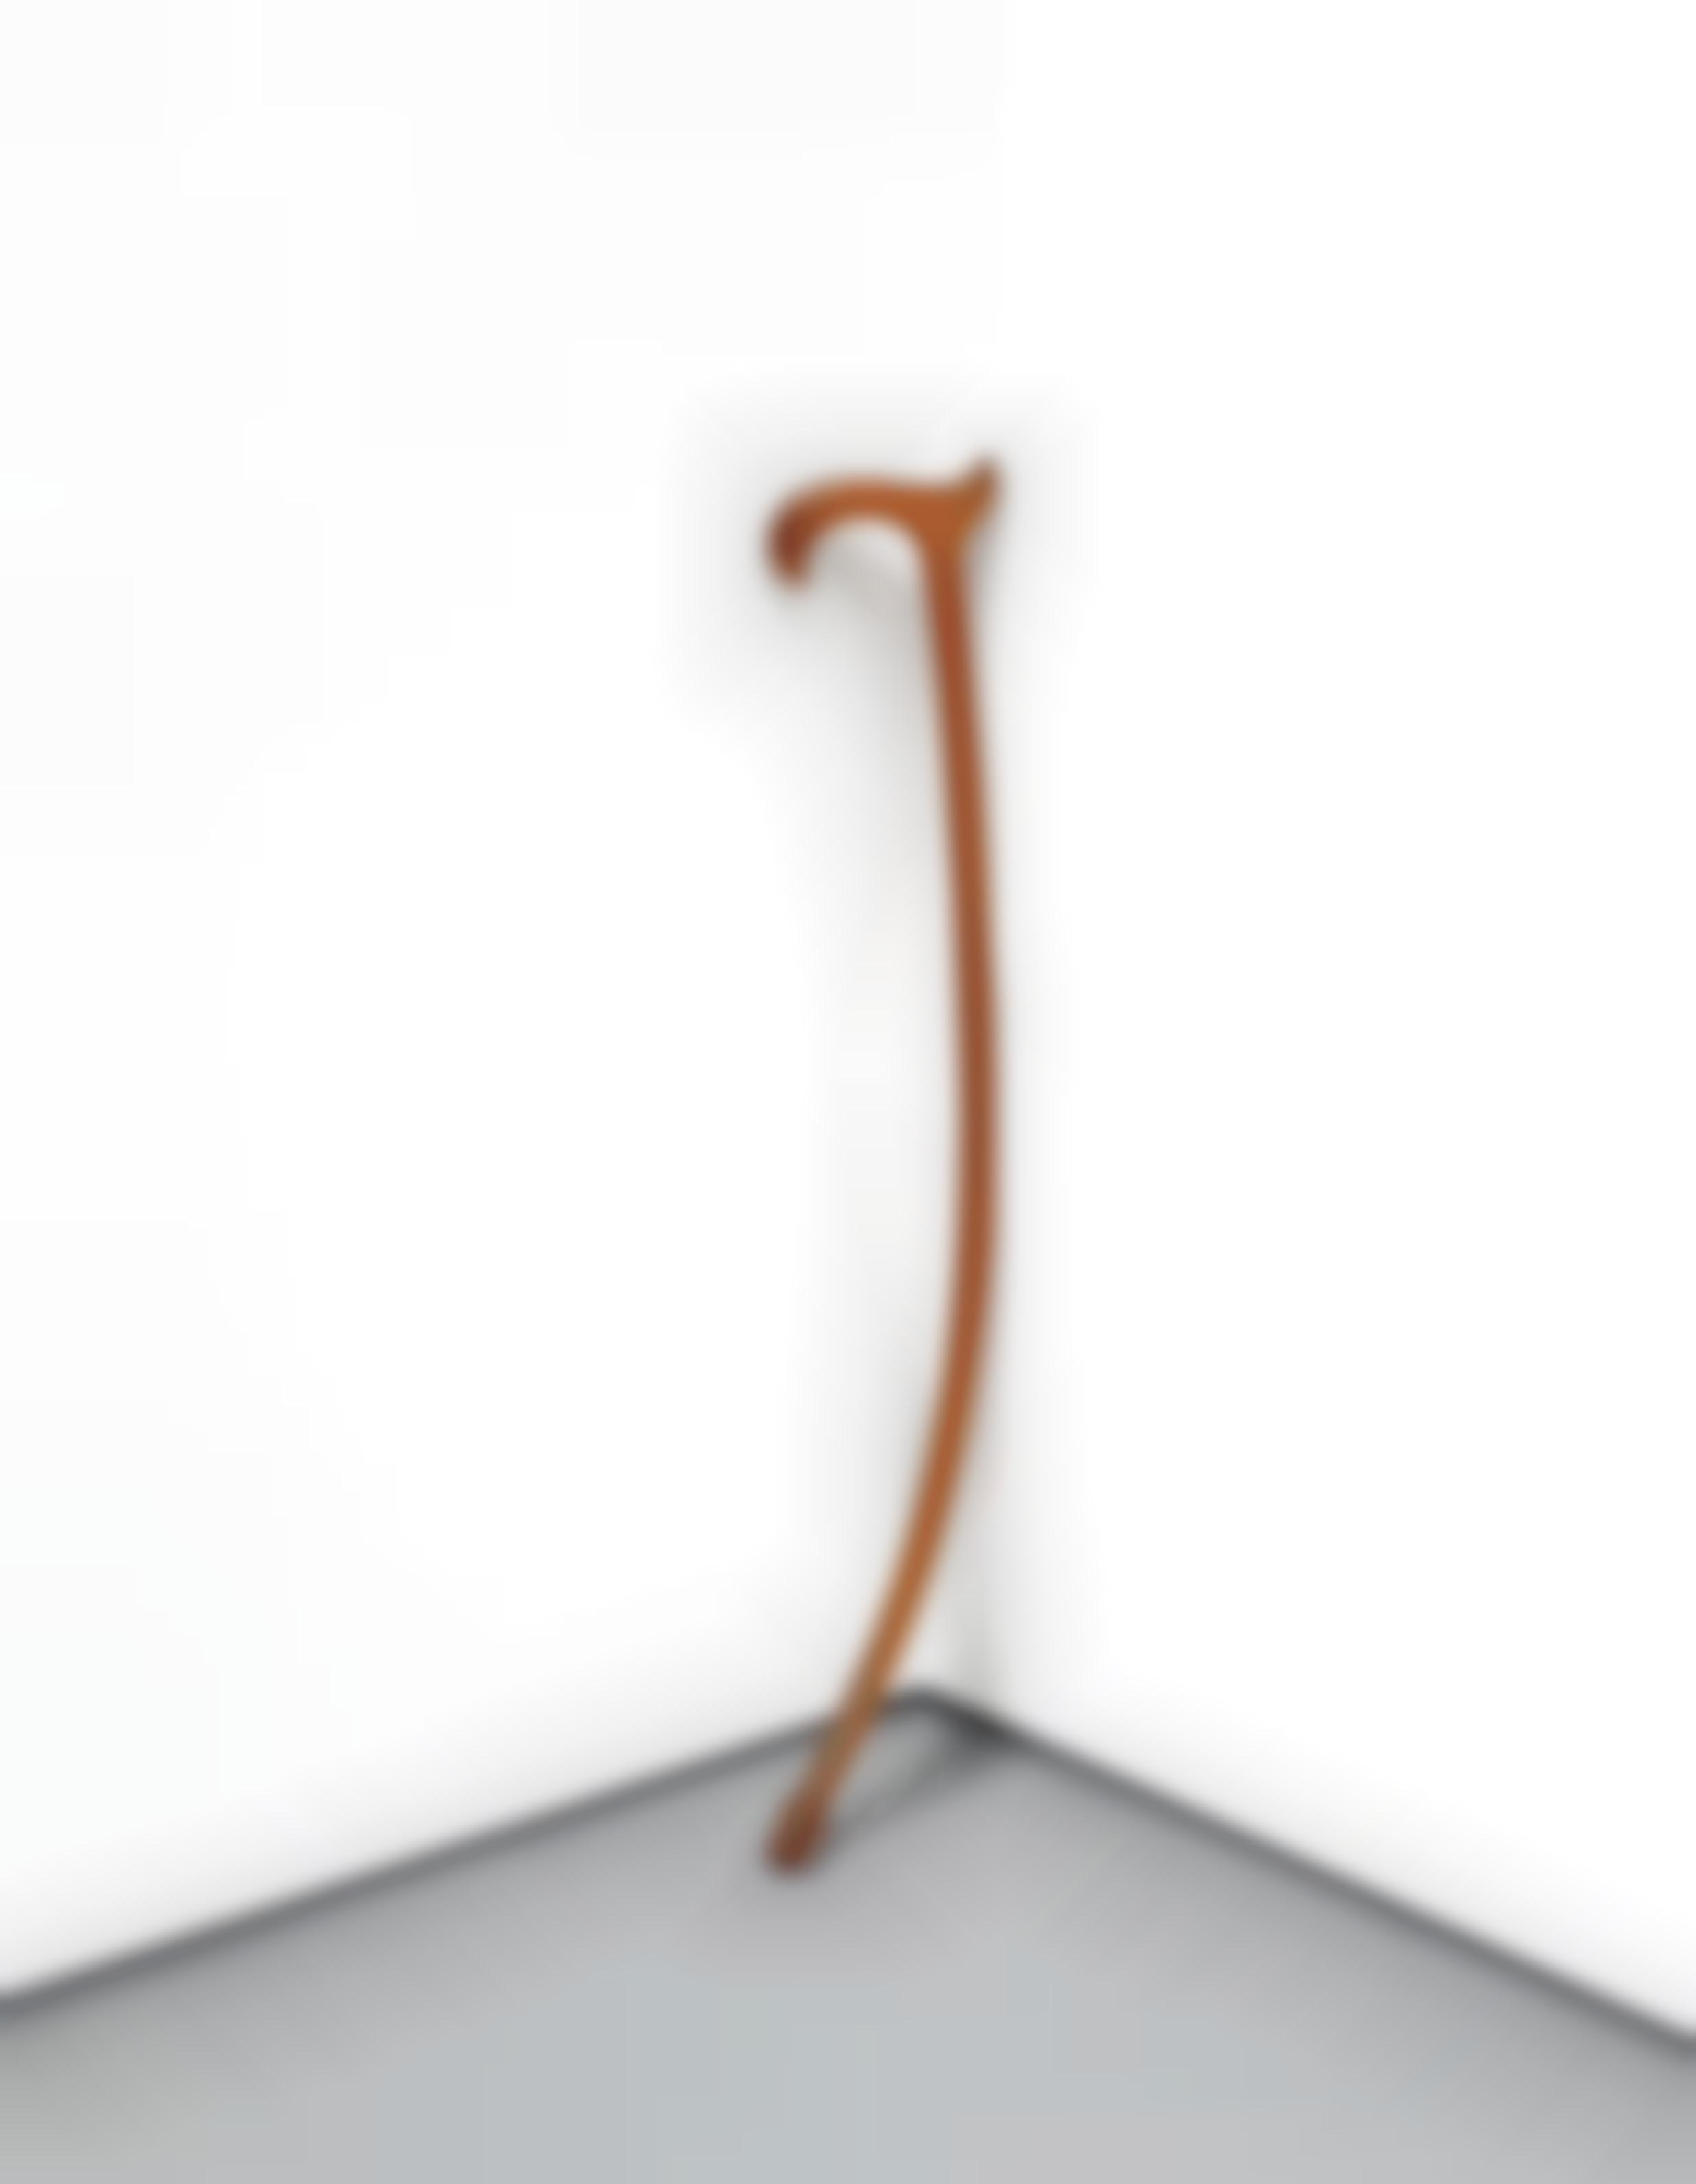 Mona Hatoum-Untitled (Stick)-2011